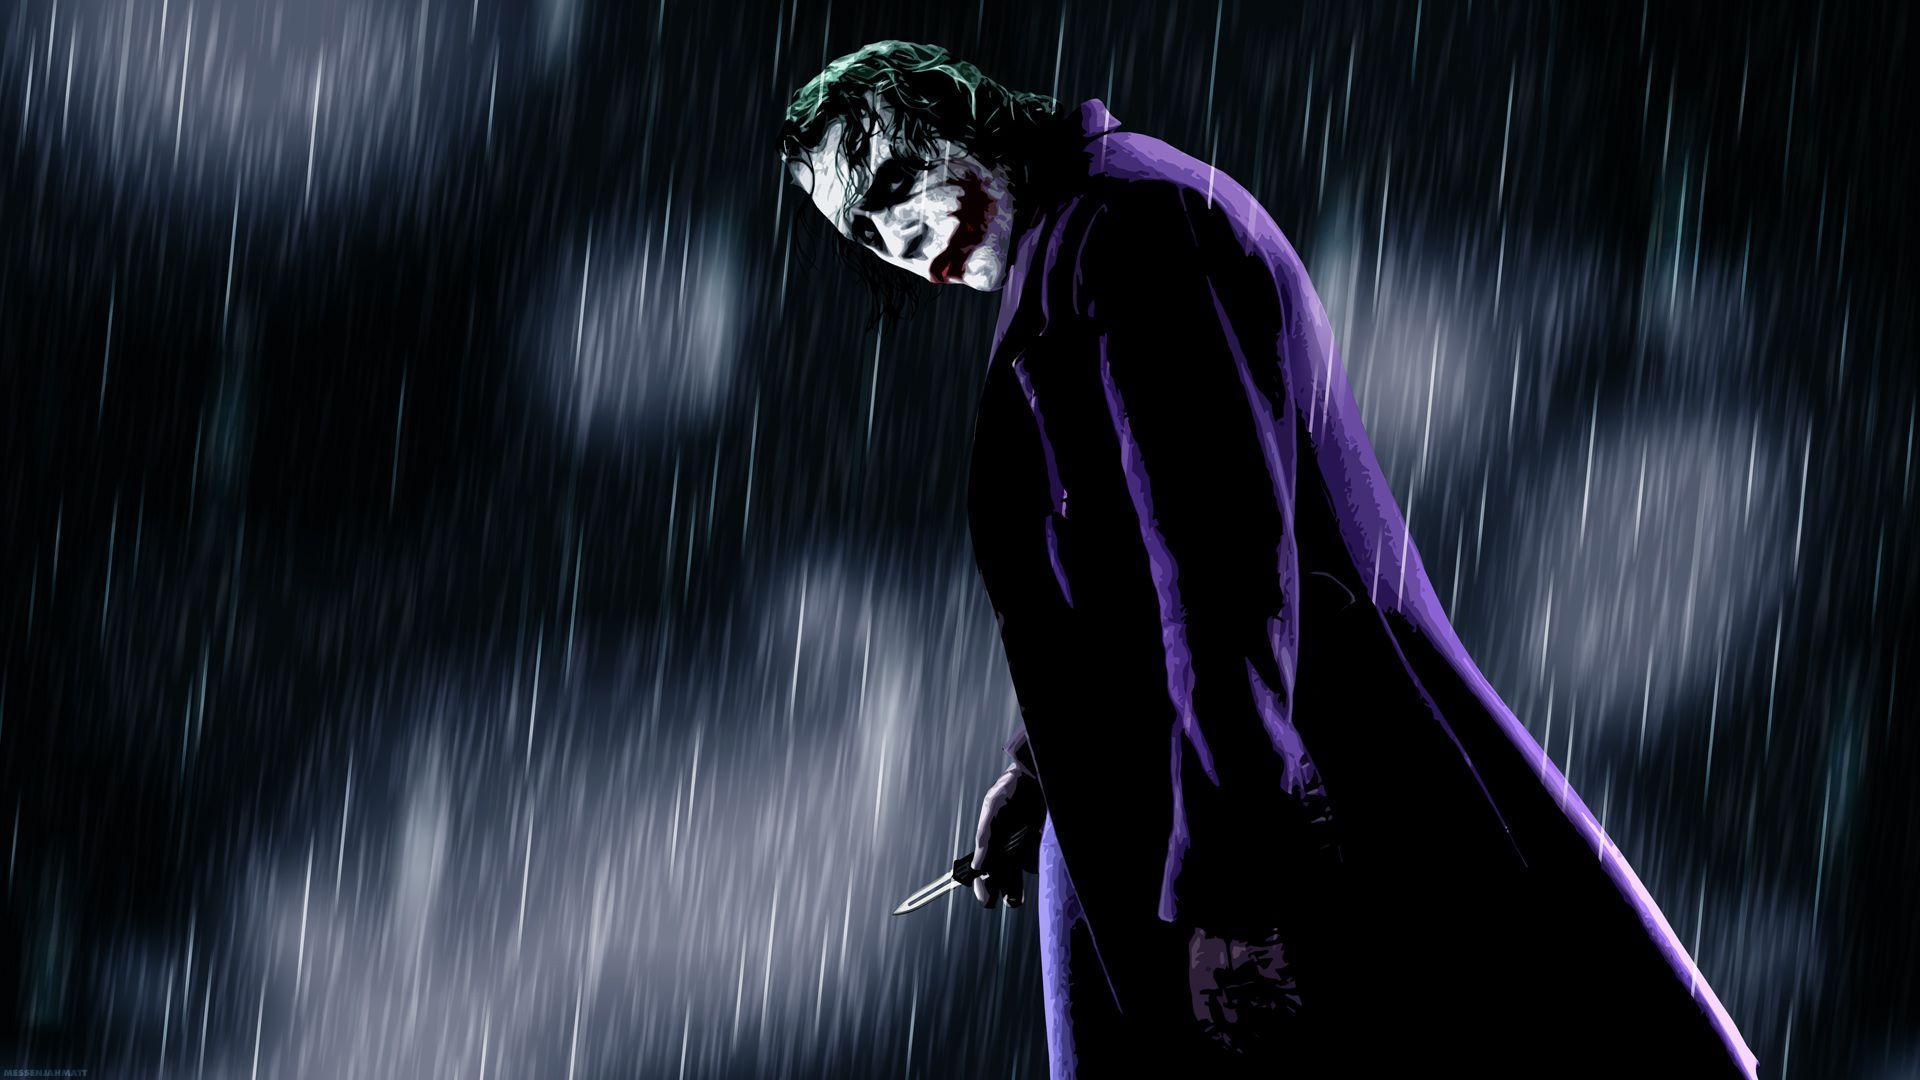 Wallpaper download joker - Joker The Joker Wallpaper 28092695 Fanpop